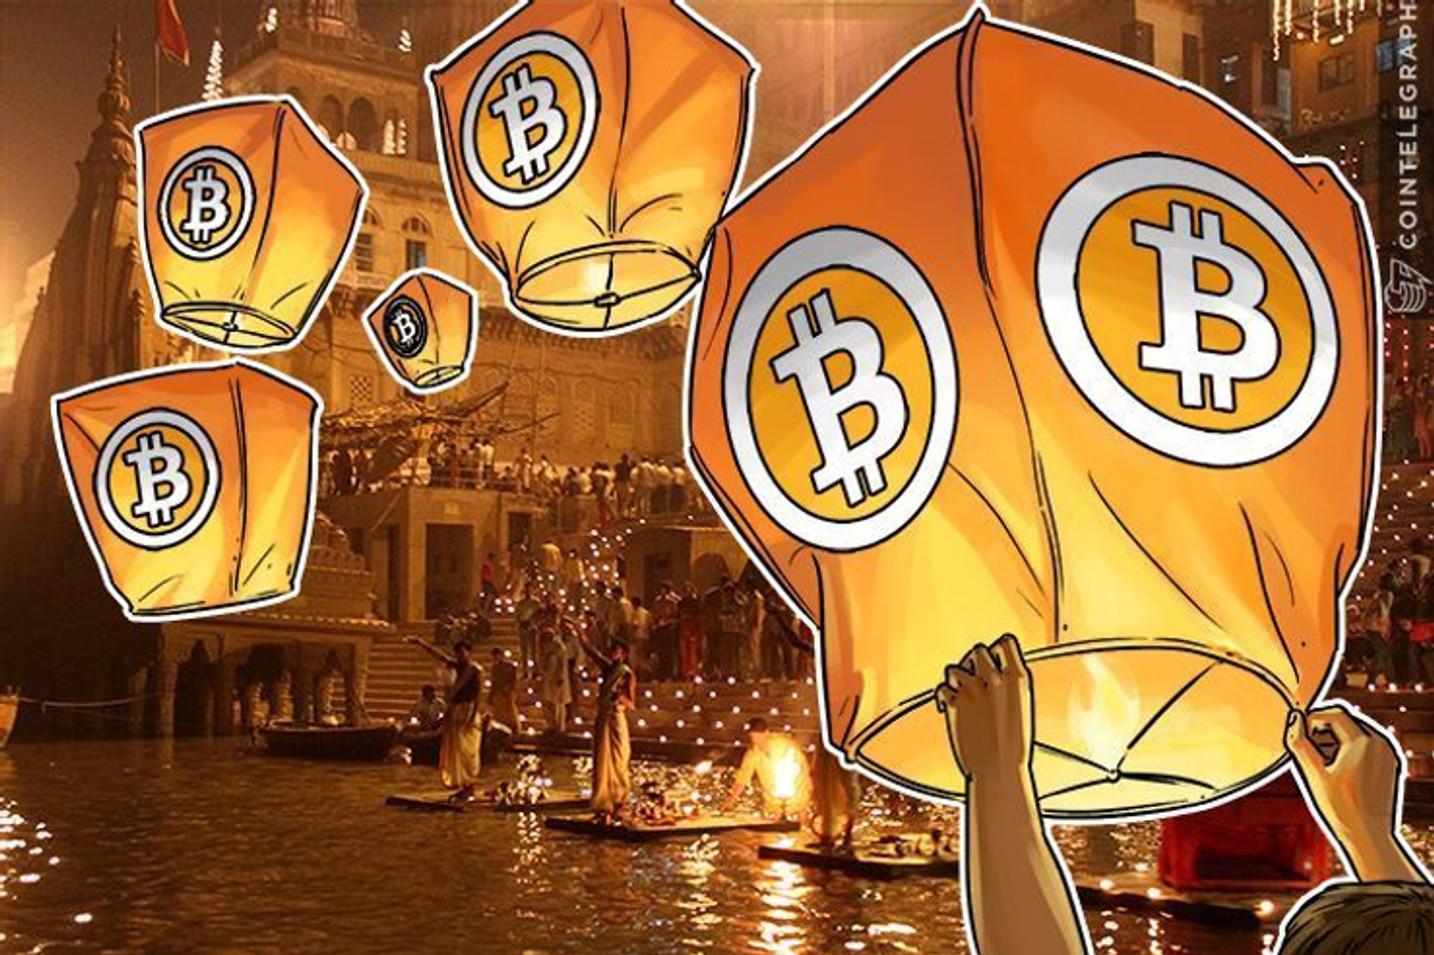 Justiça do Rio de Janeiro oferece curso para juízes entenderem o que é Bitcoin e criptomoedas